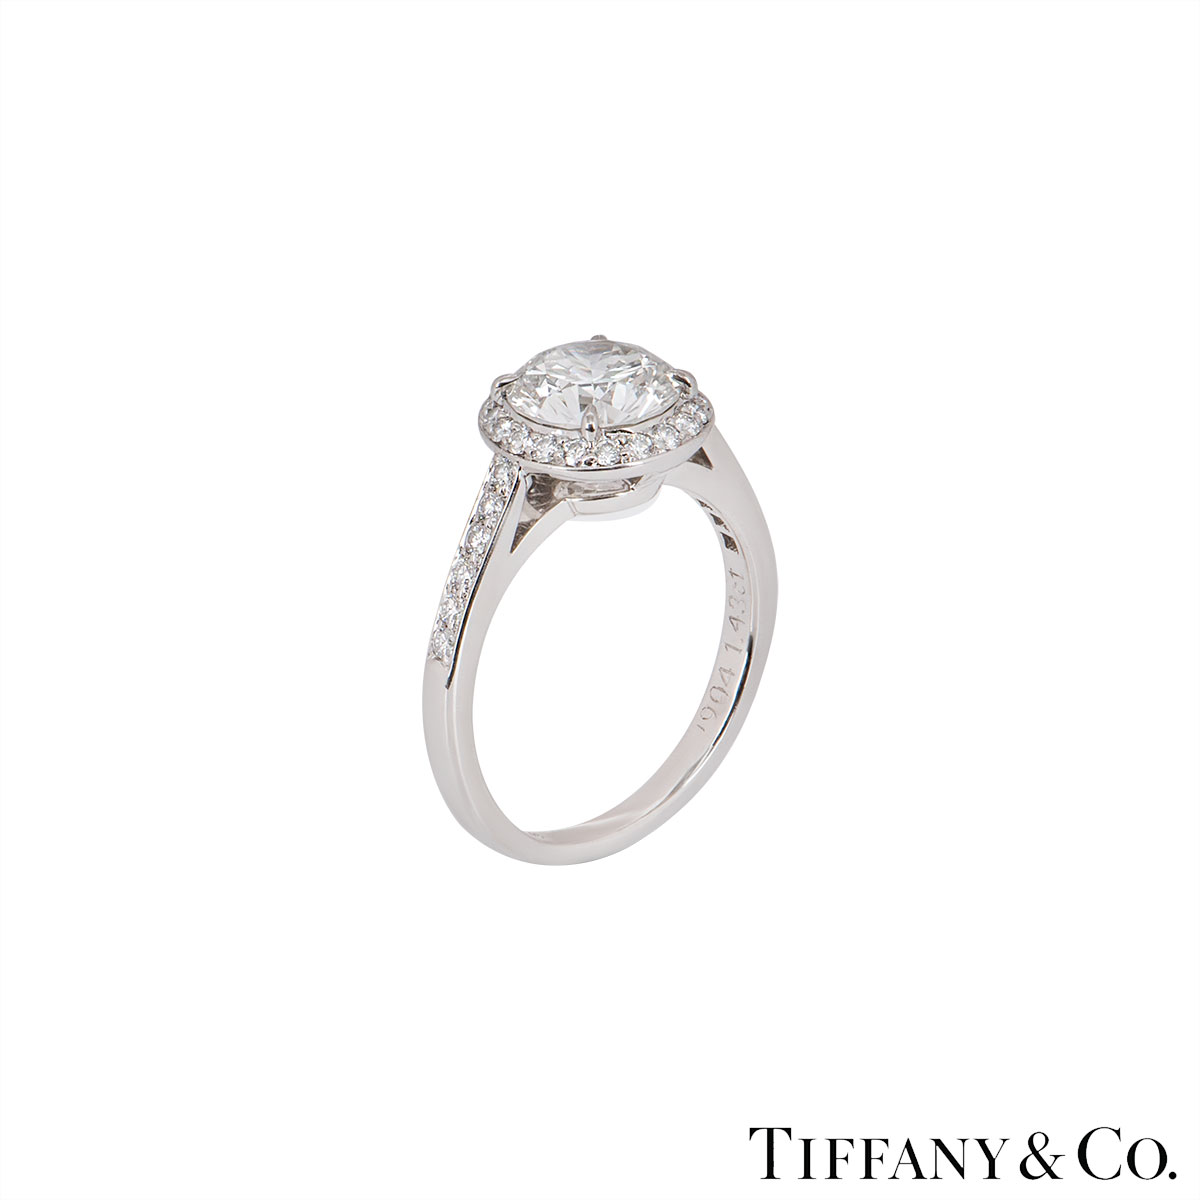 Tiffany & Co. Platinum Diamond Soleste Ring 1.43ct H/IF